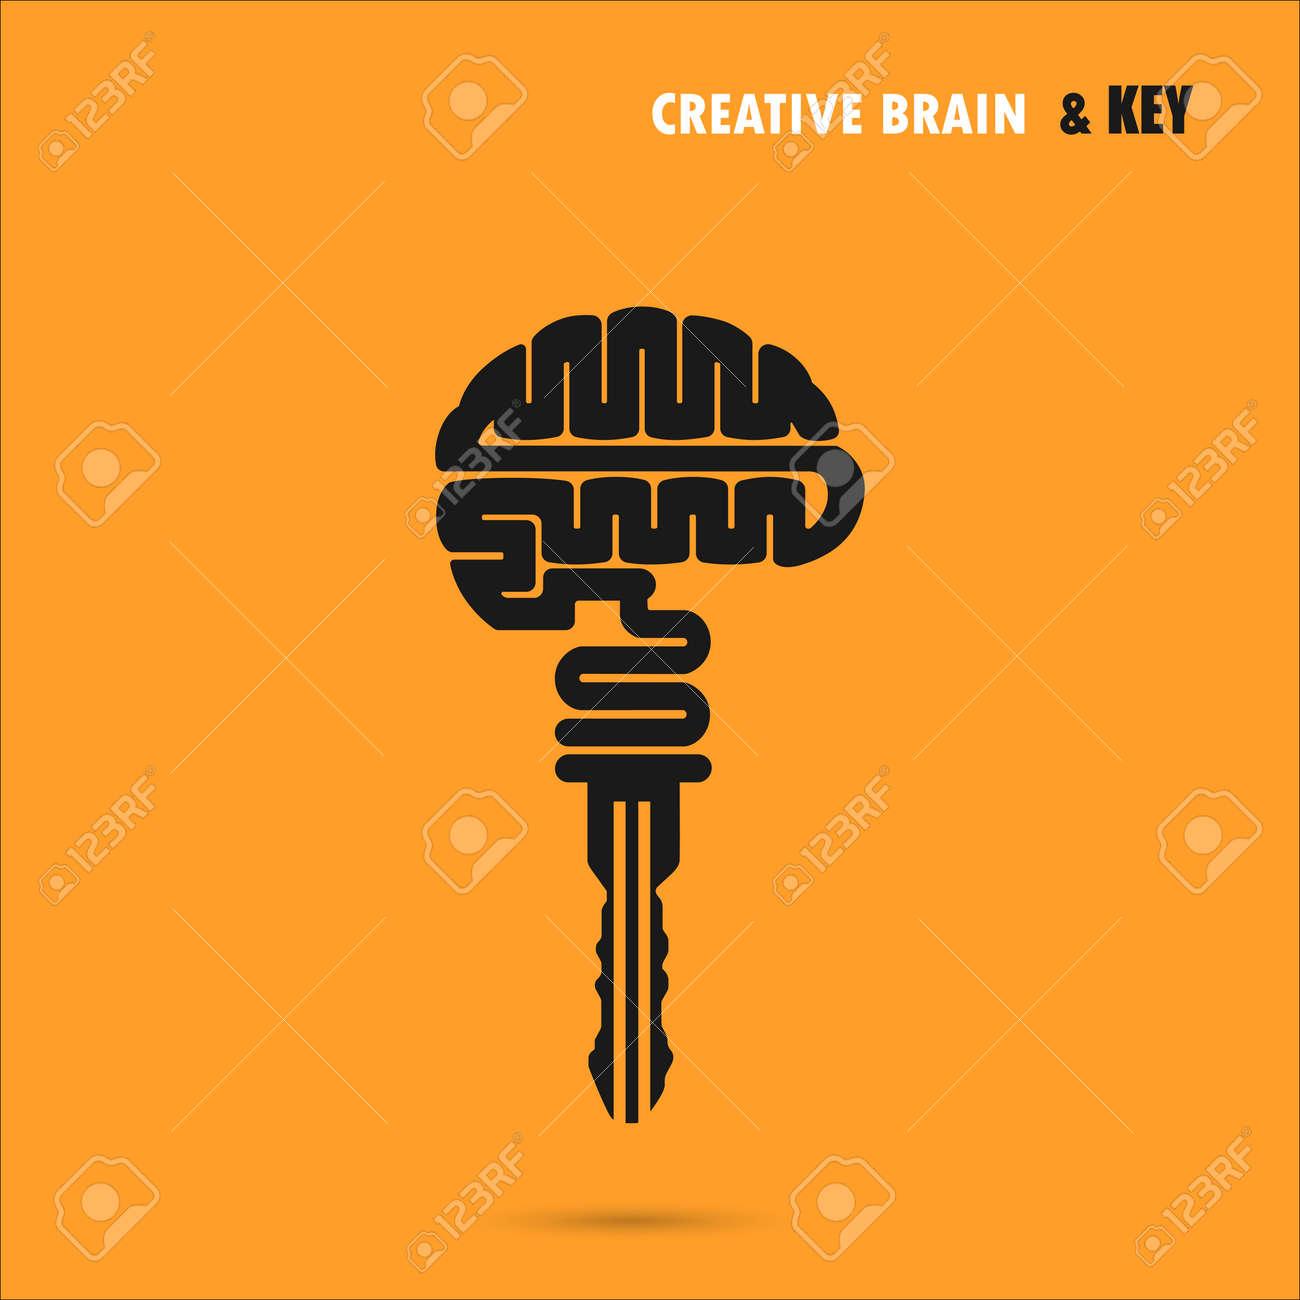 Creative Brain Sign With Key Symbol Key Of Successncept Of Ideas